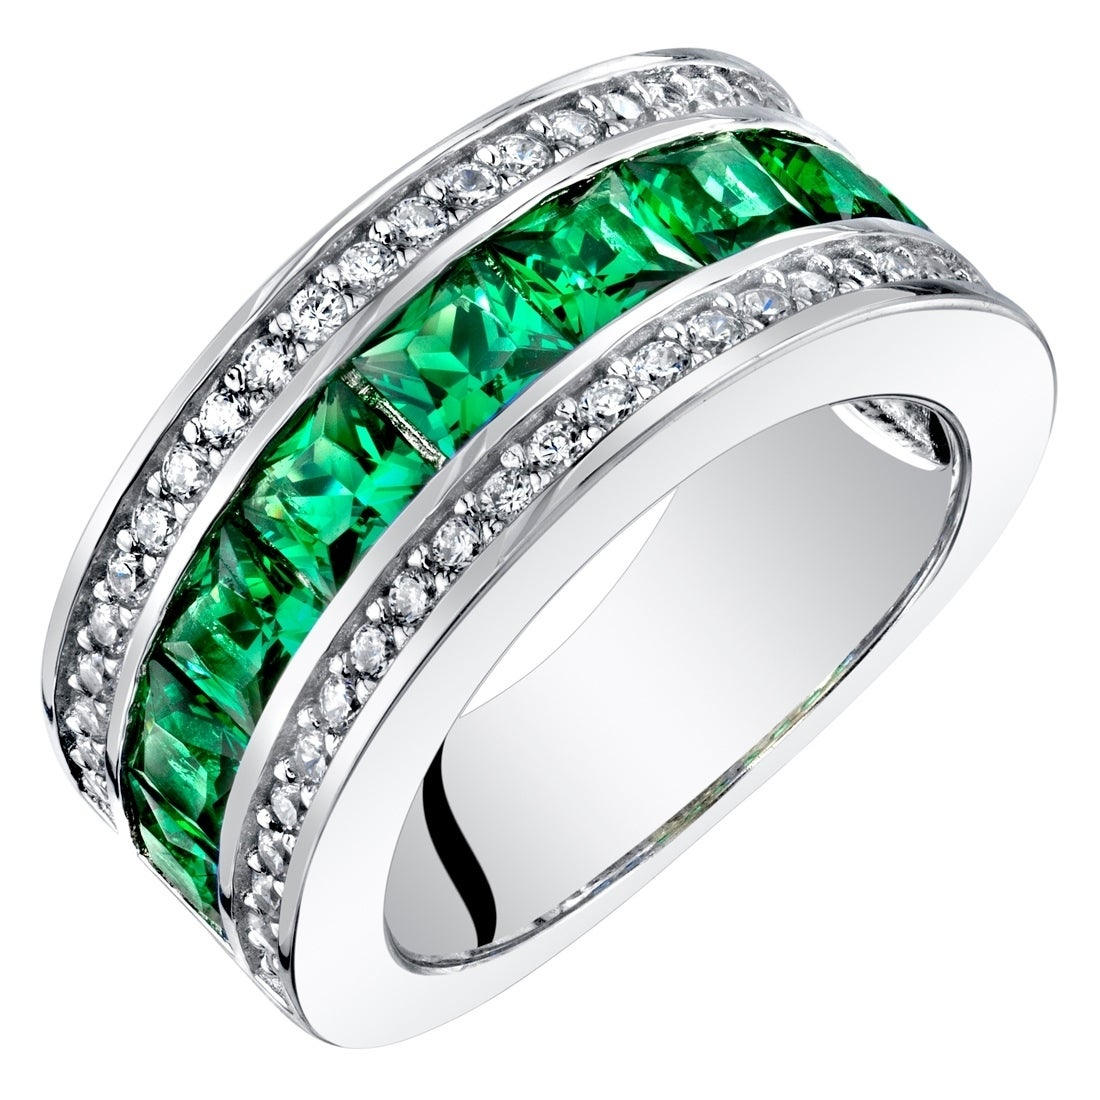 Shop Sterling Silver Princess Cut Simulated Emerald 3 Row Wedding